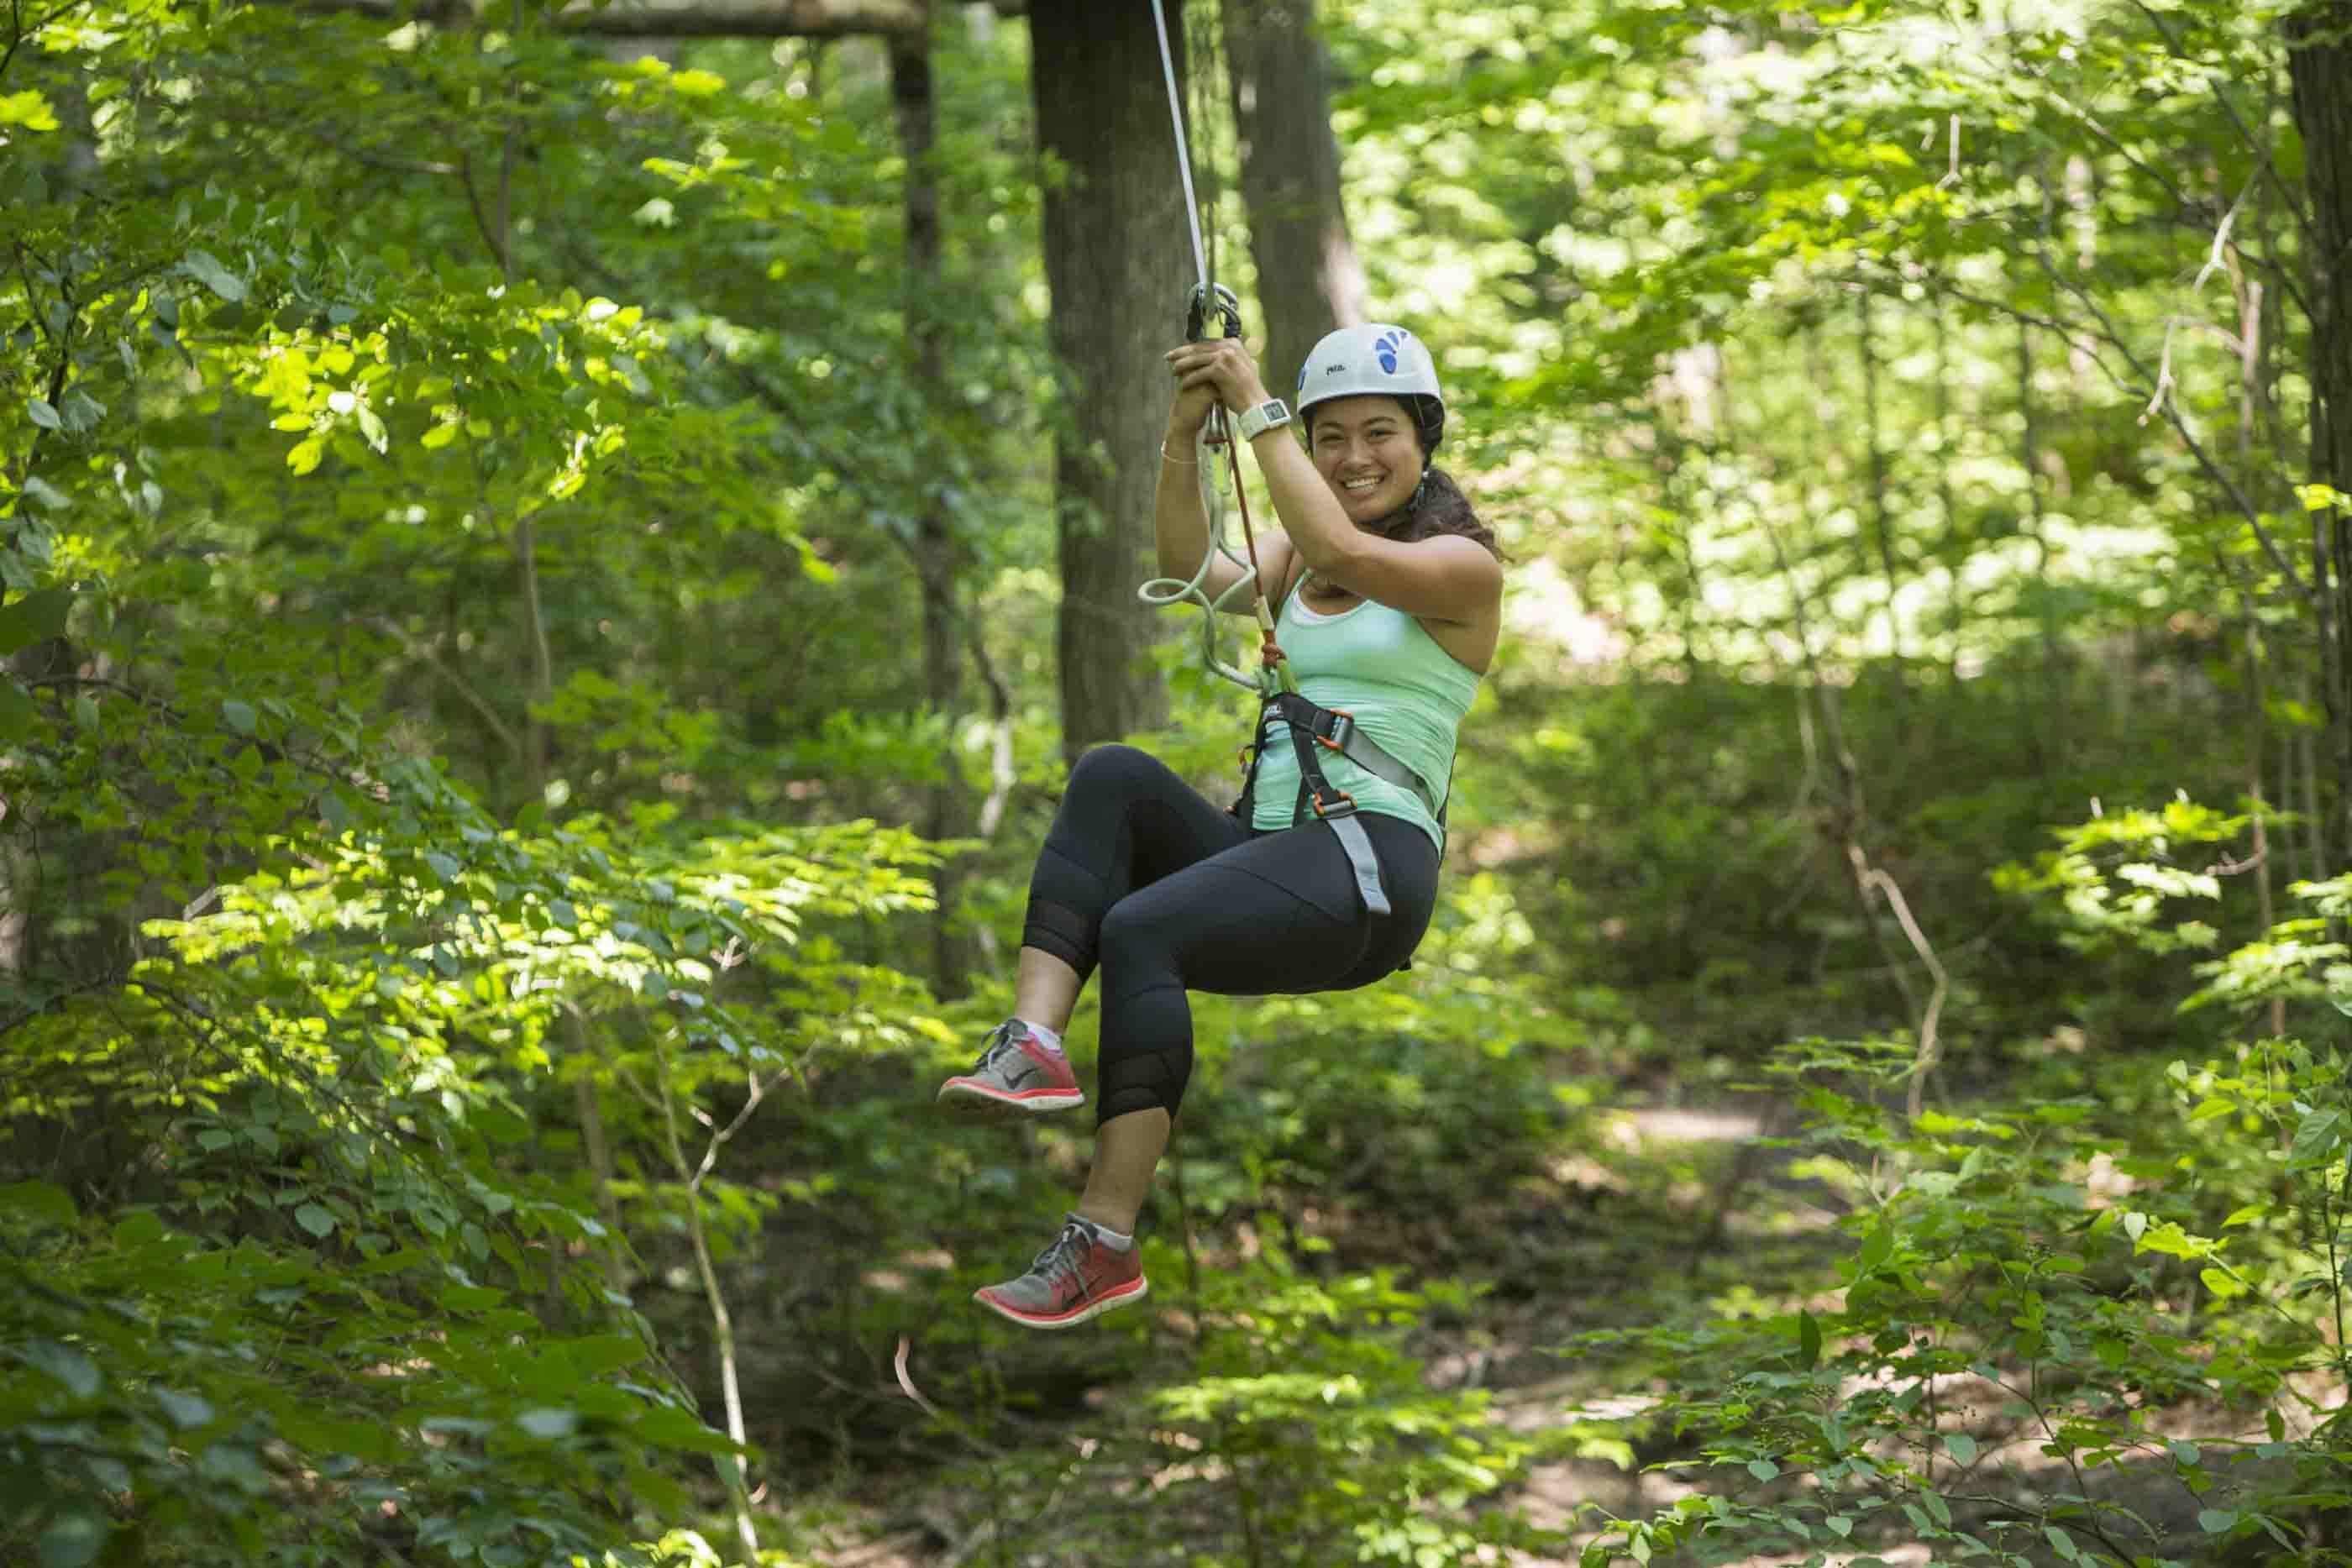 treetop experience - Experiences